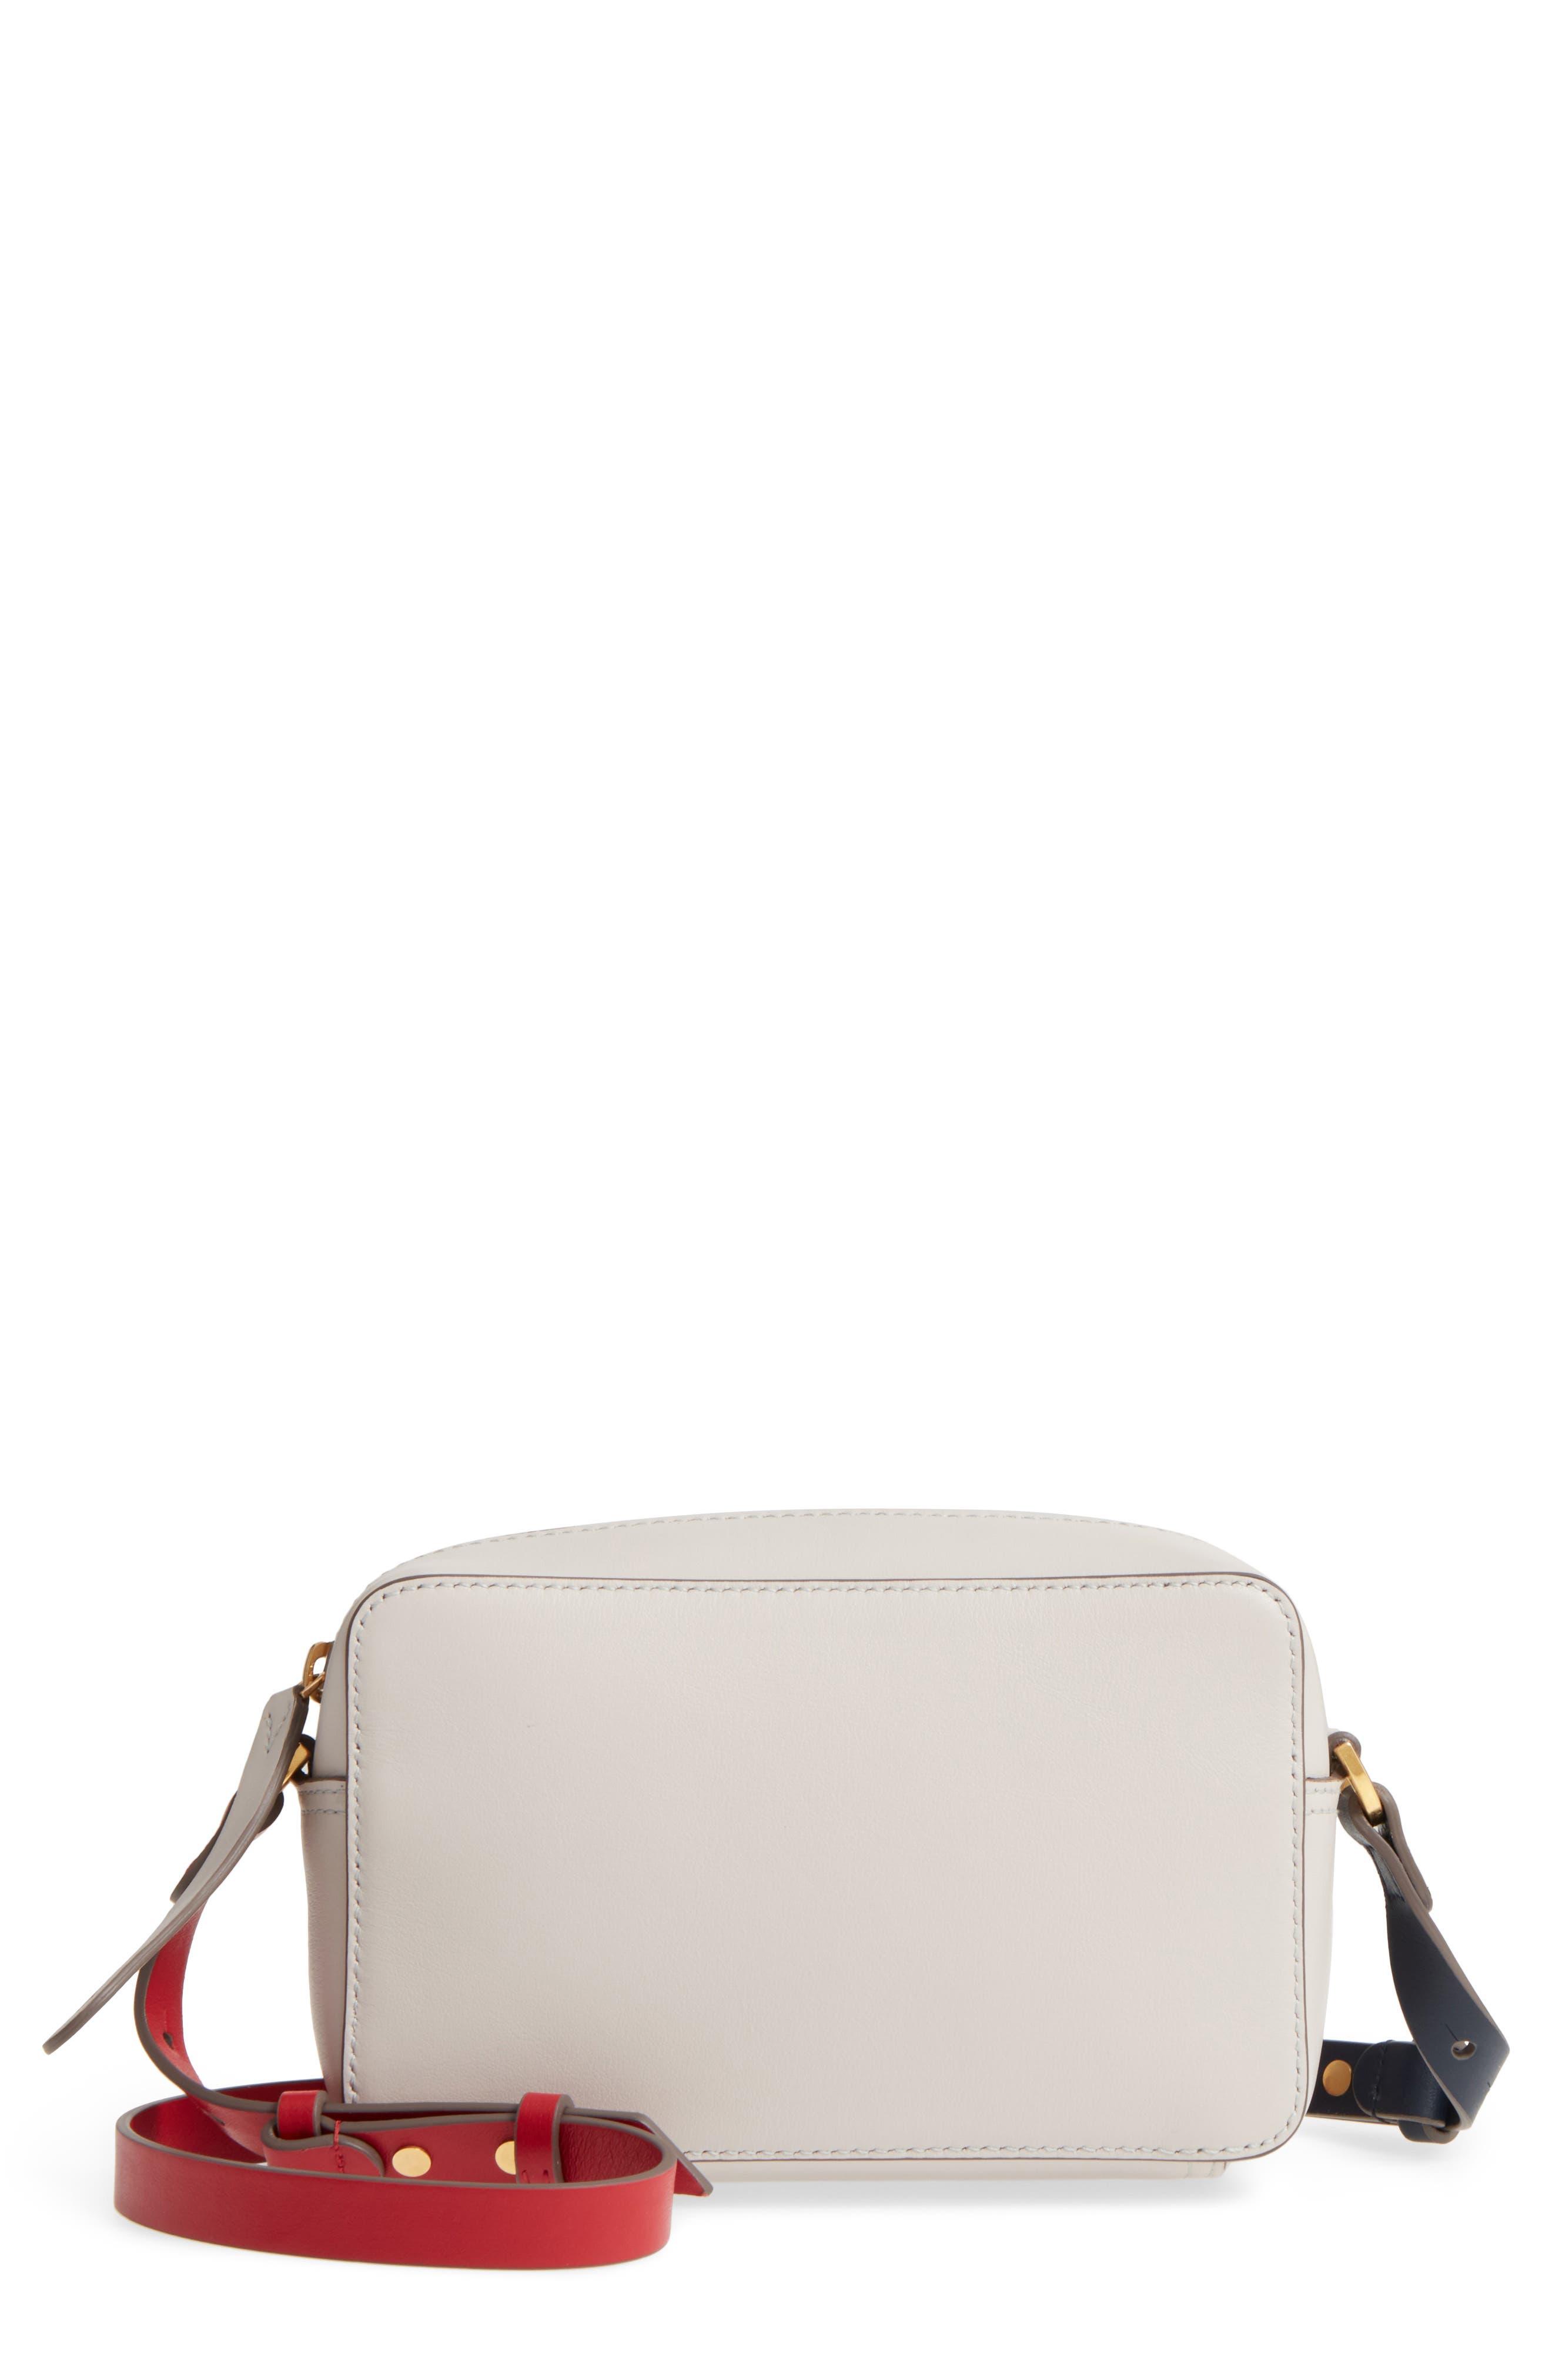 Anya Hindmarch Mini Circles Leather Crossbody Bag